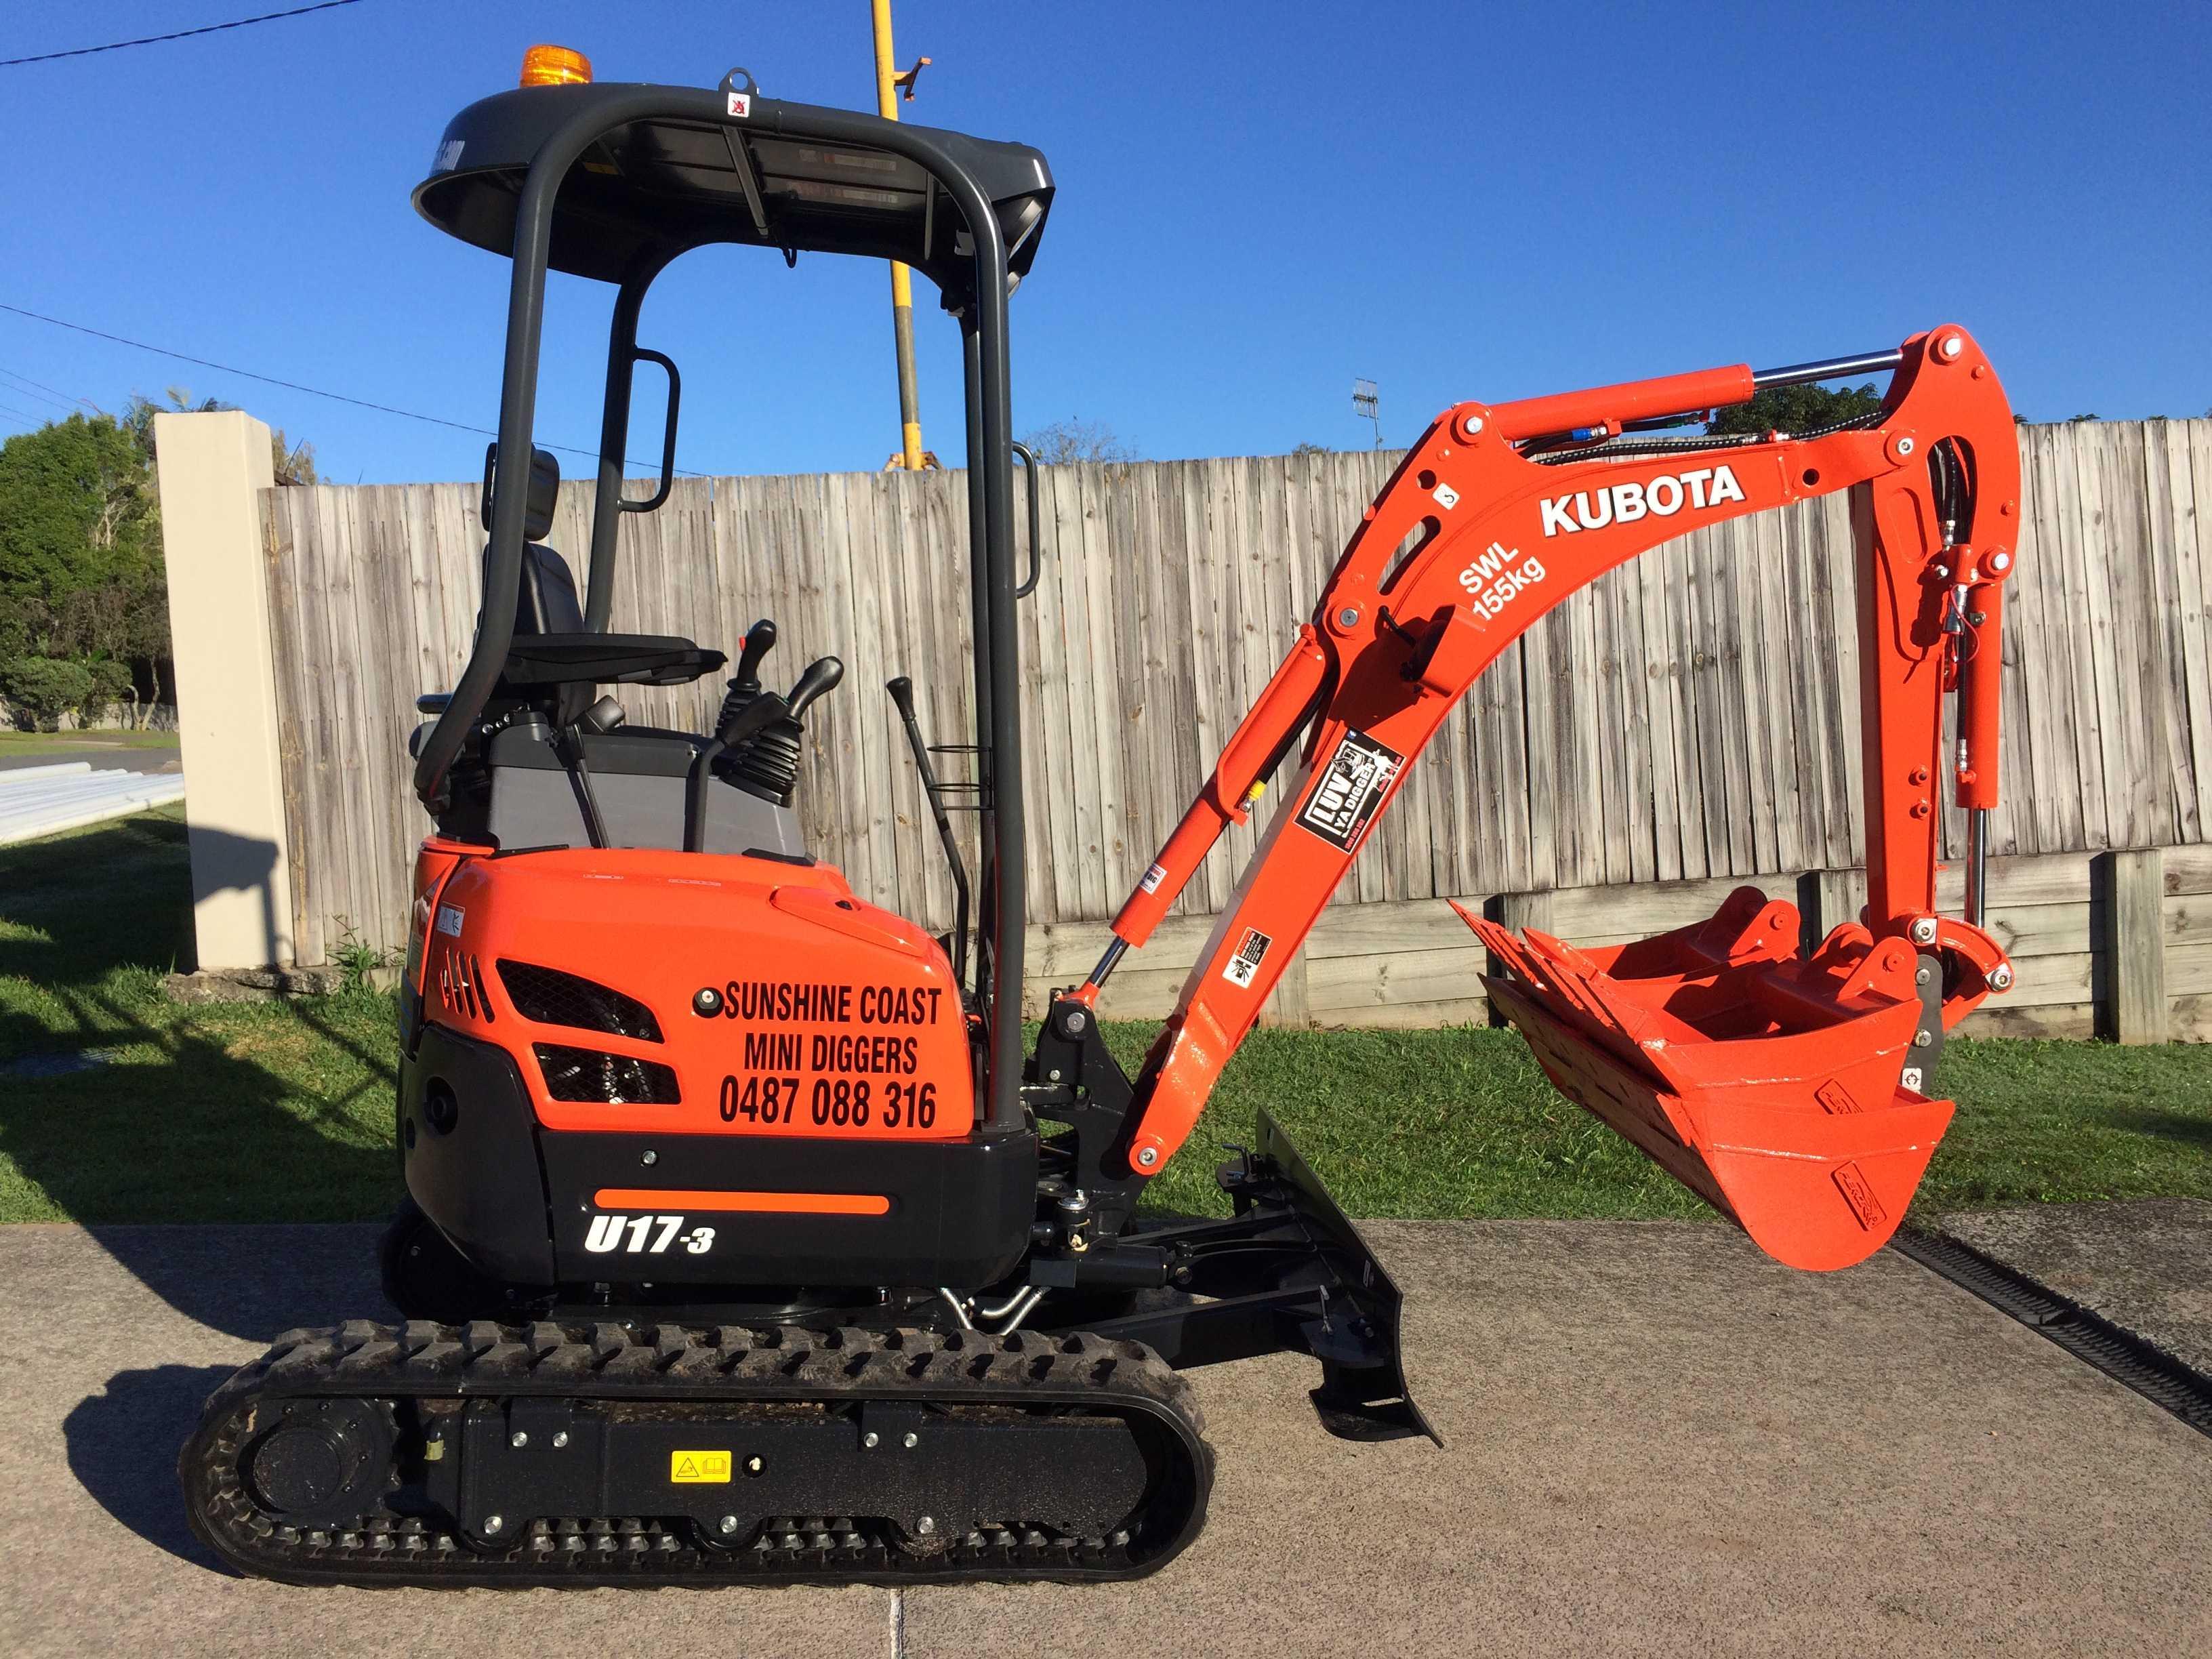 Hire 1.7T Tracked Excavator